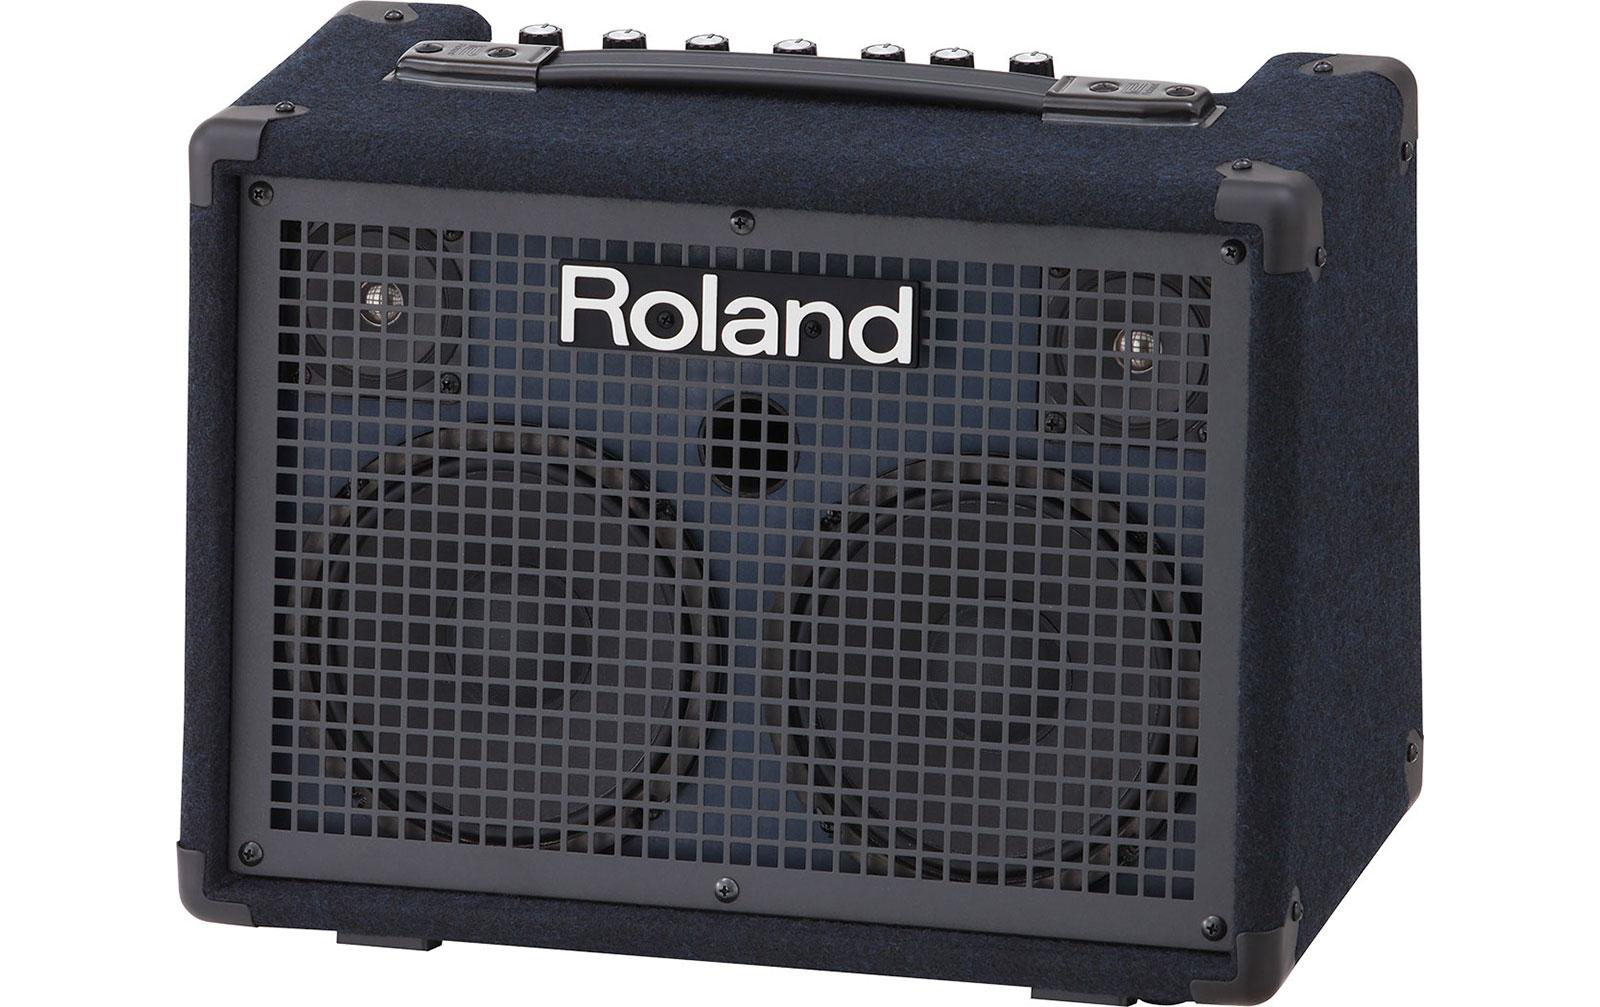 roland-kc-220